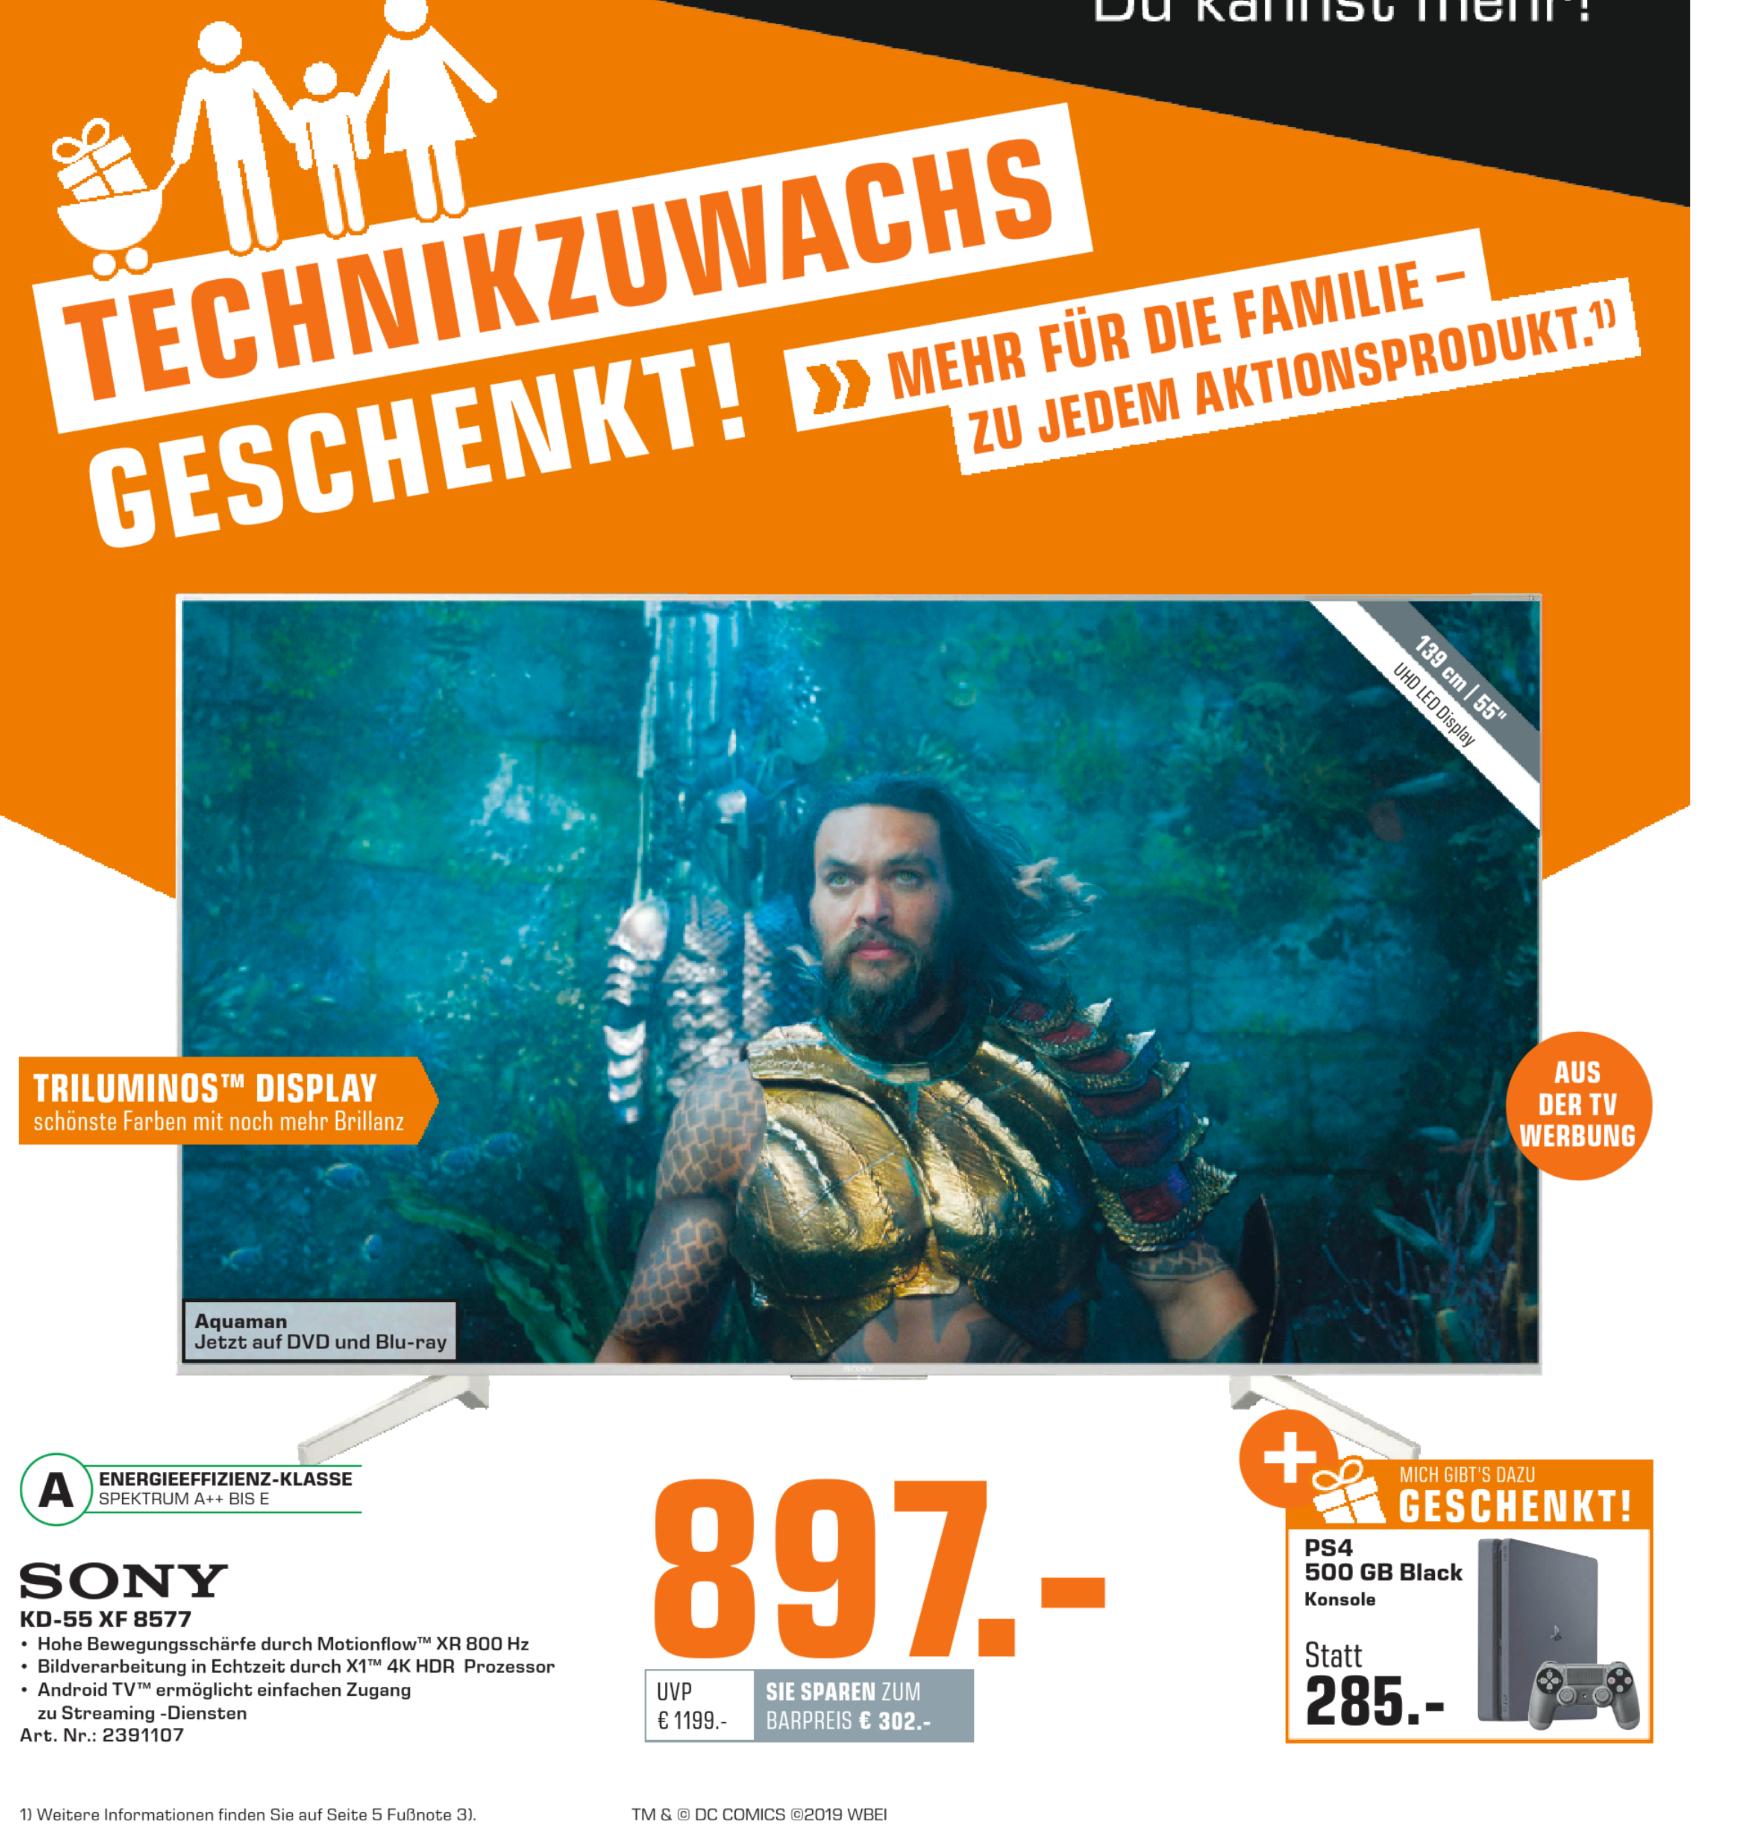 Sony KD-55XF8577 + PS4 Slim 500GB | AVM Fritz!Box 7490 + Fritz!Fon C5 @169€  | Xbox One S 1TB FH4 + Huawei Y7 @211€ | uvm. [Technik Zuwachs]